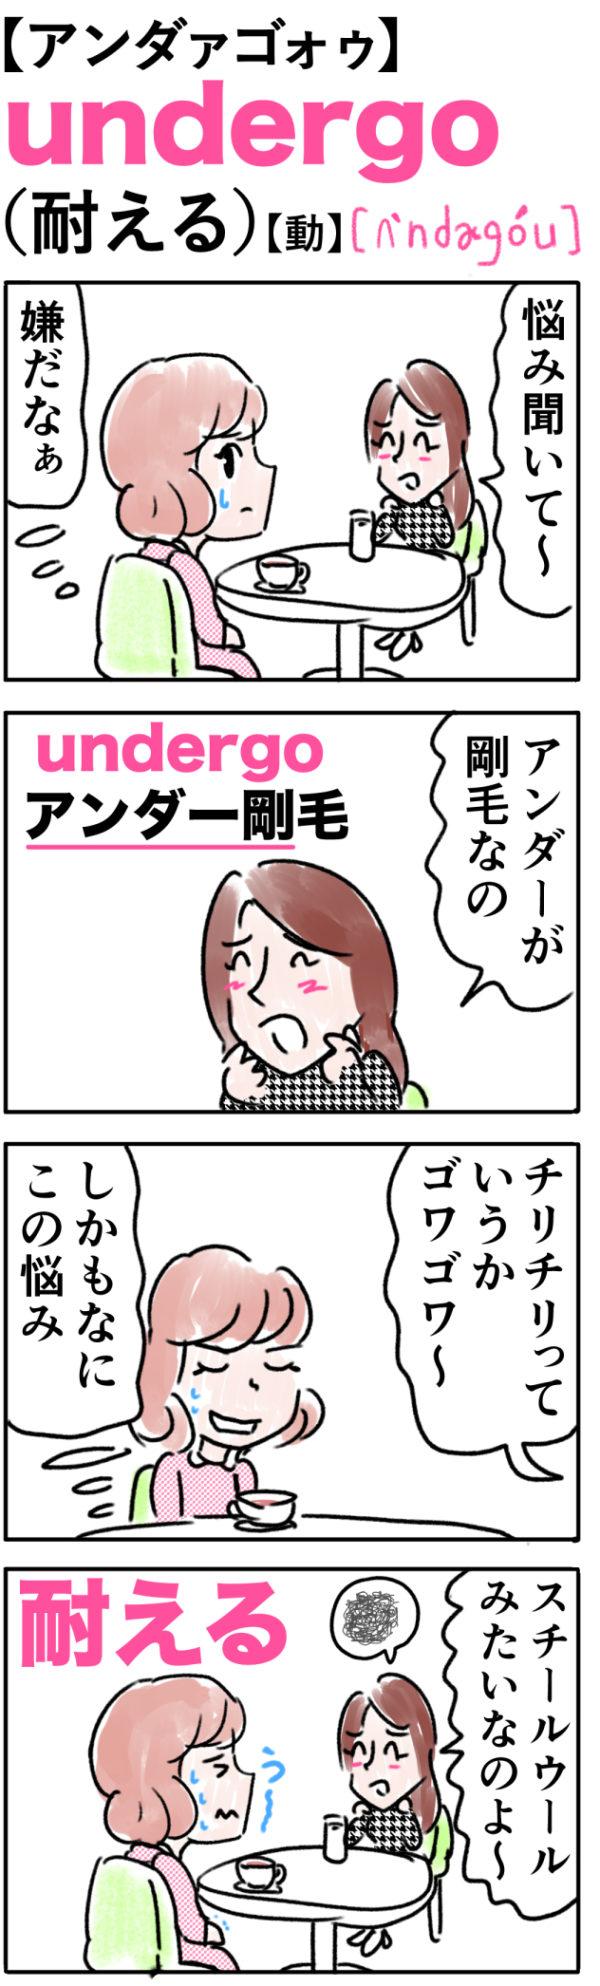 undergo(耐える)の語呂合わせ英単語